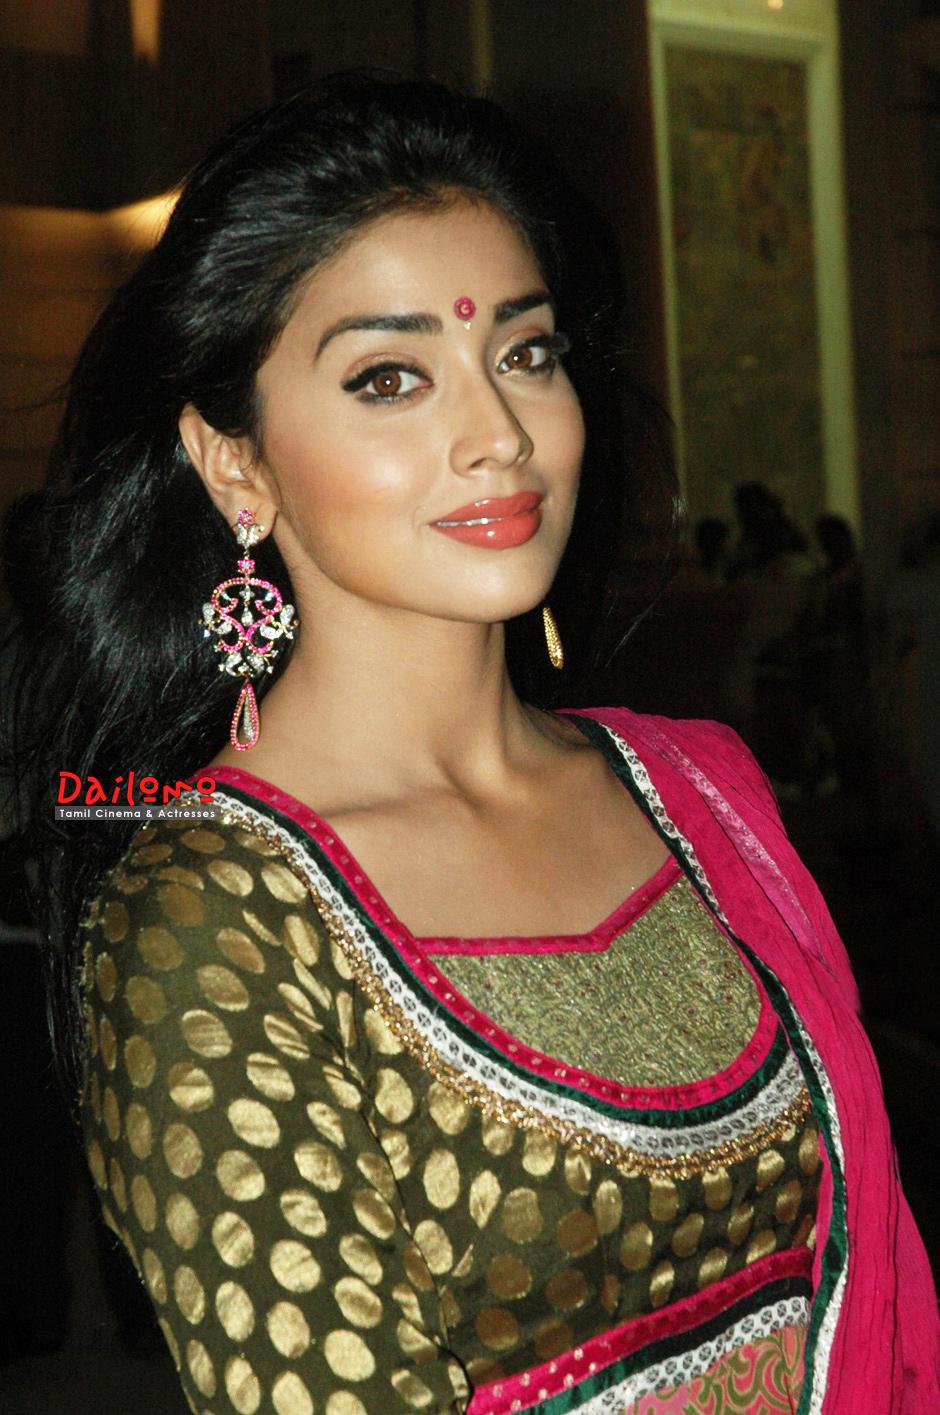 Sexy Film Blue Film Hindi